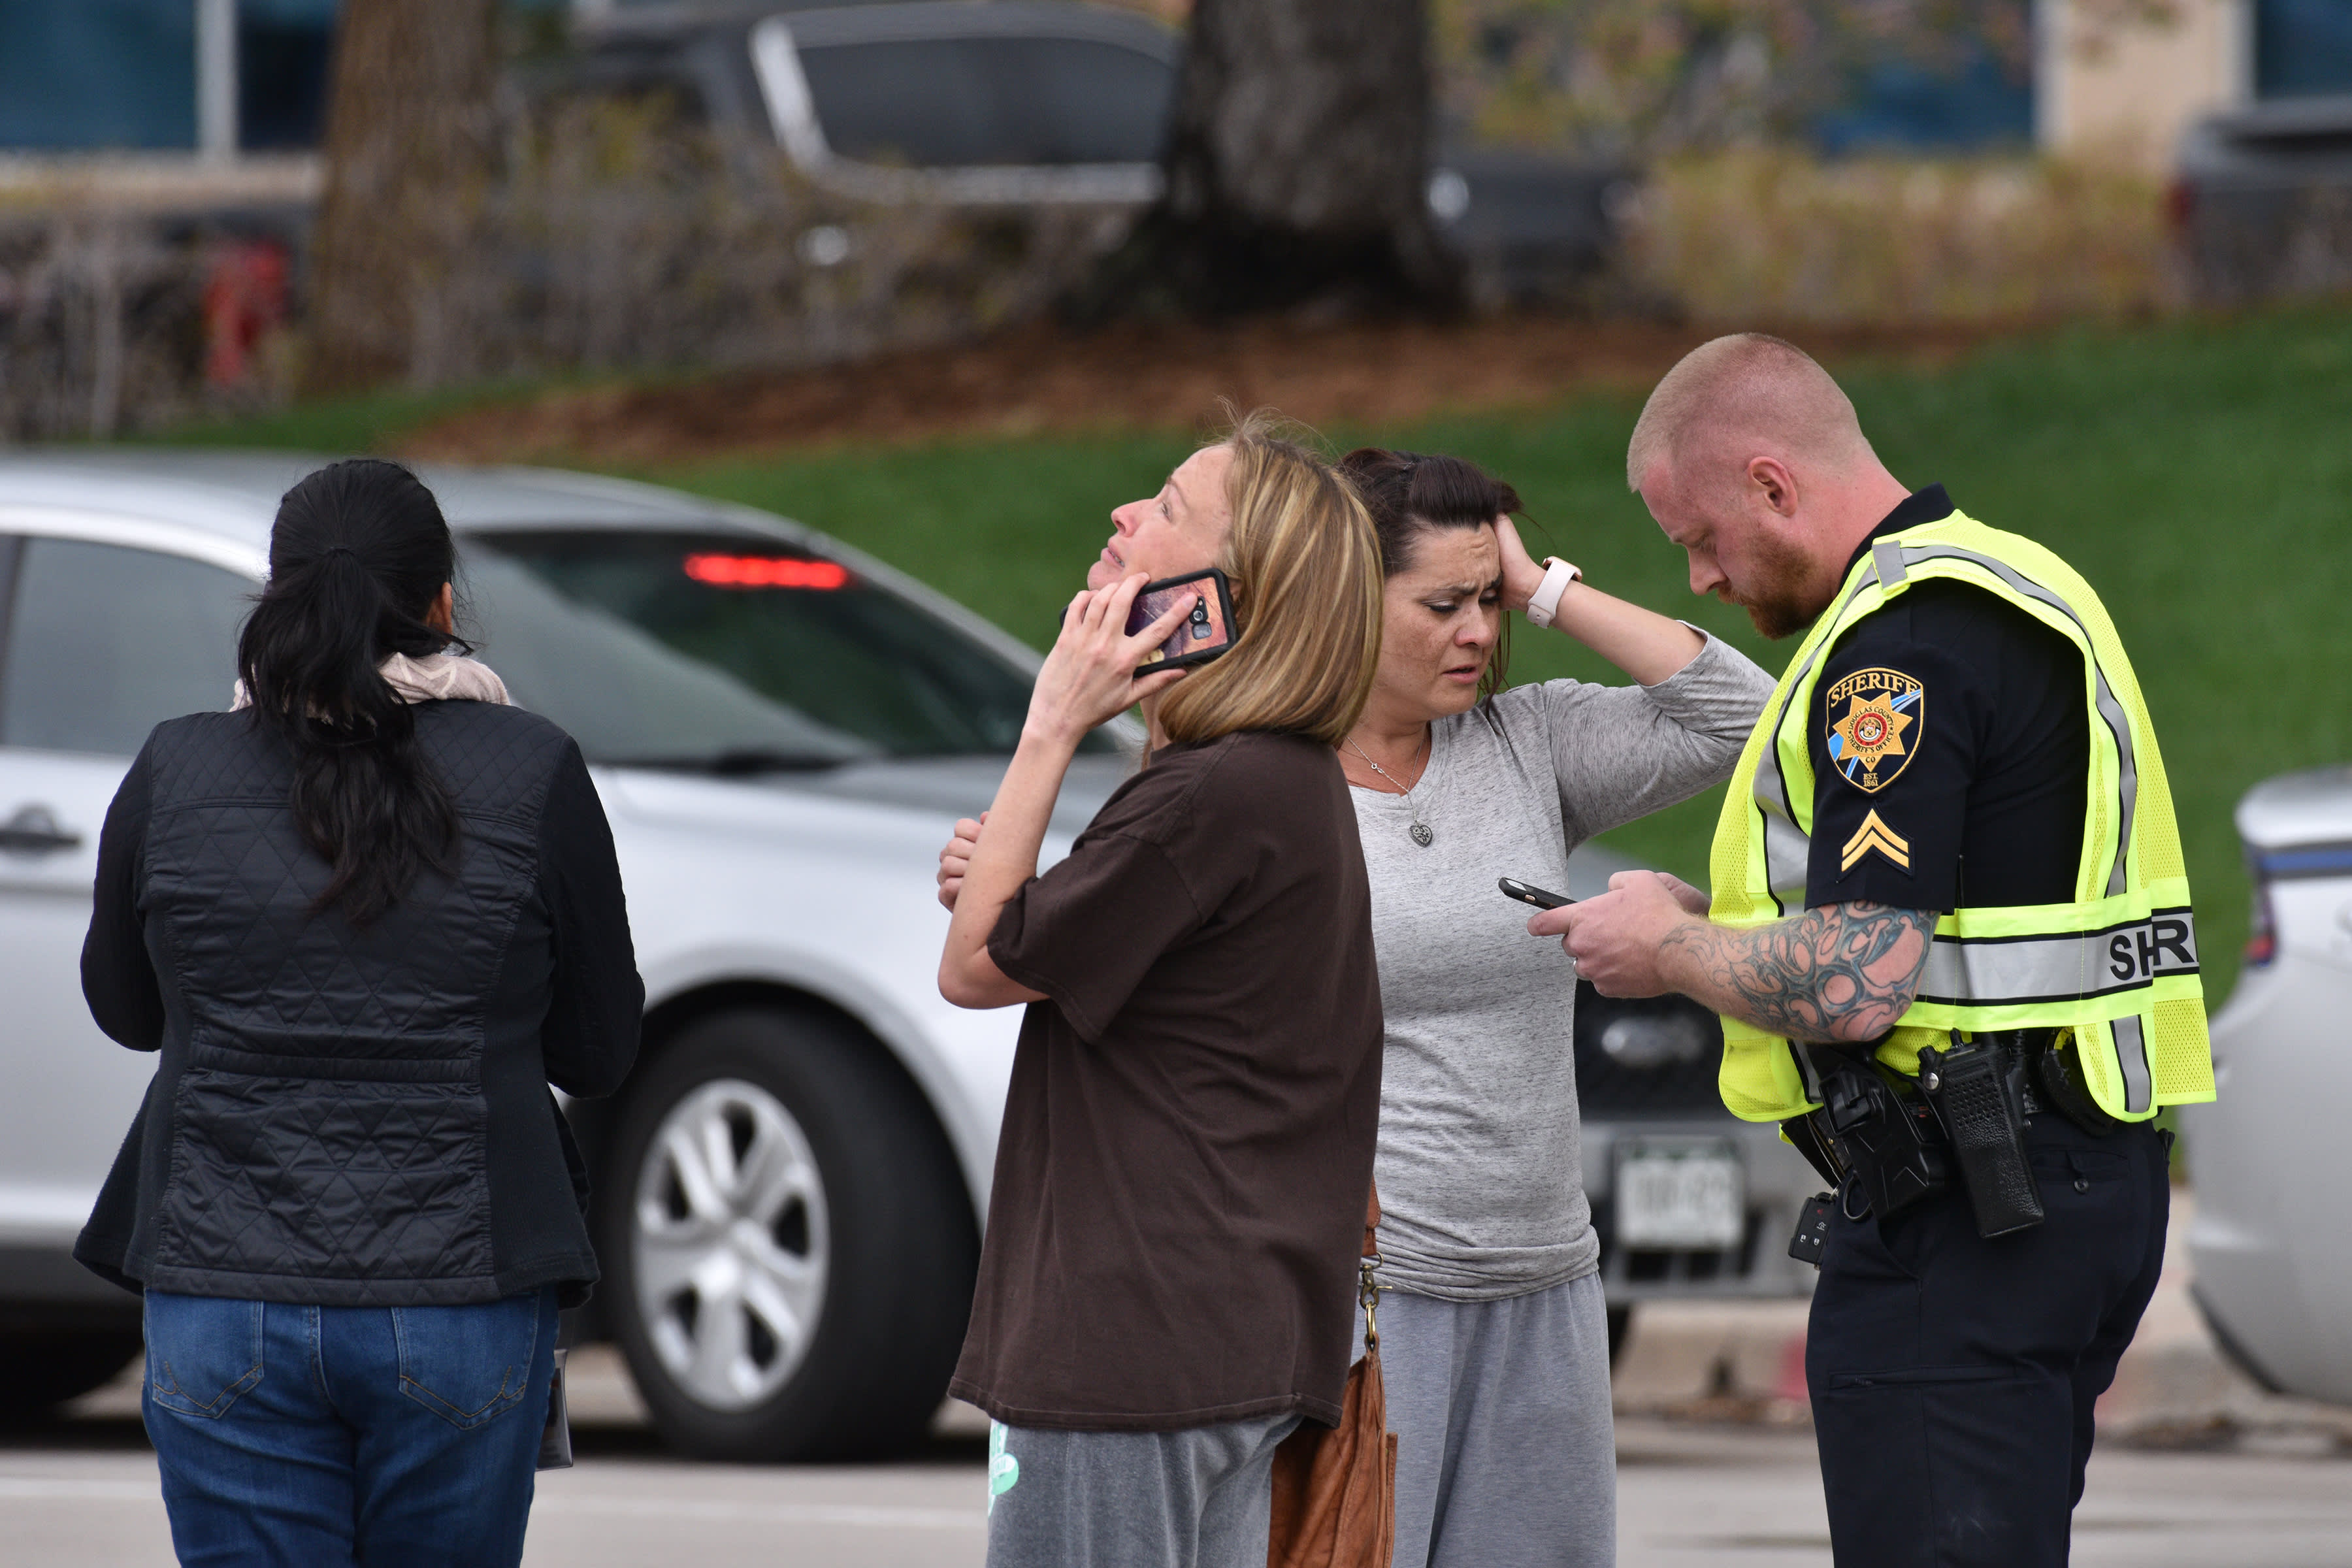 denver school shooting 2020